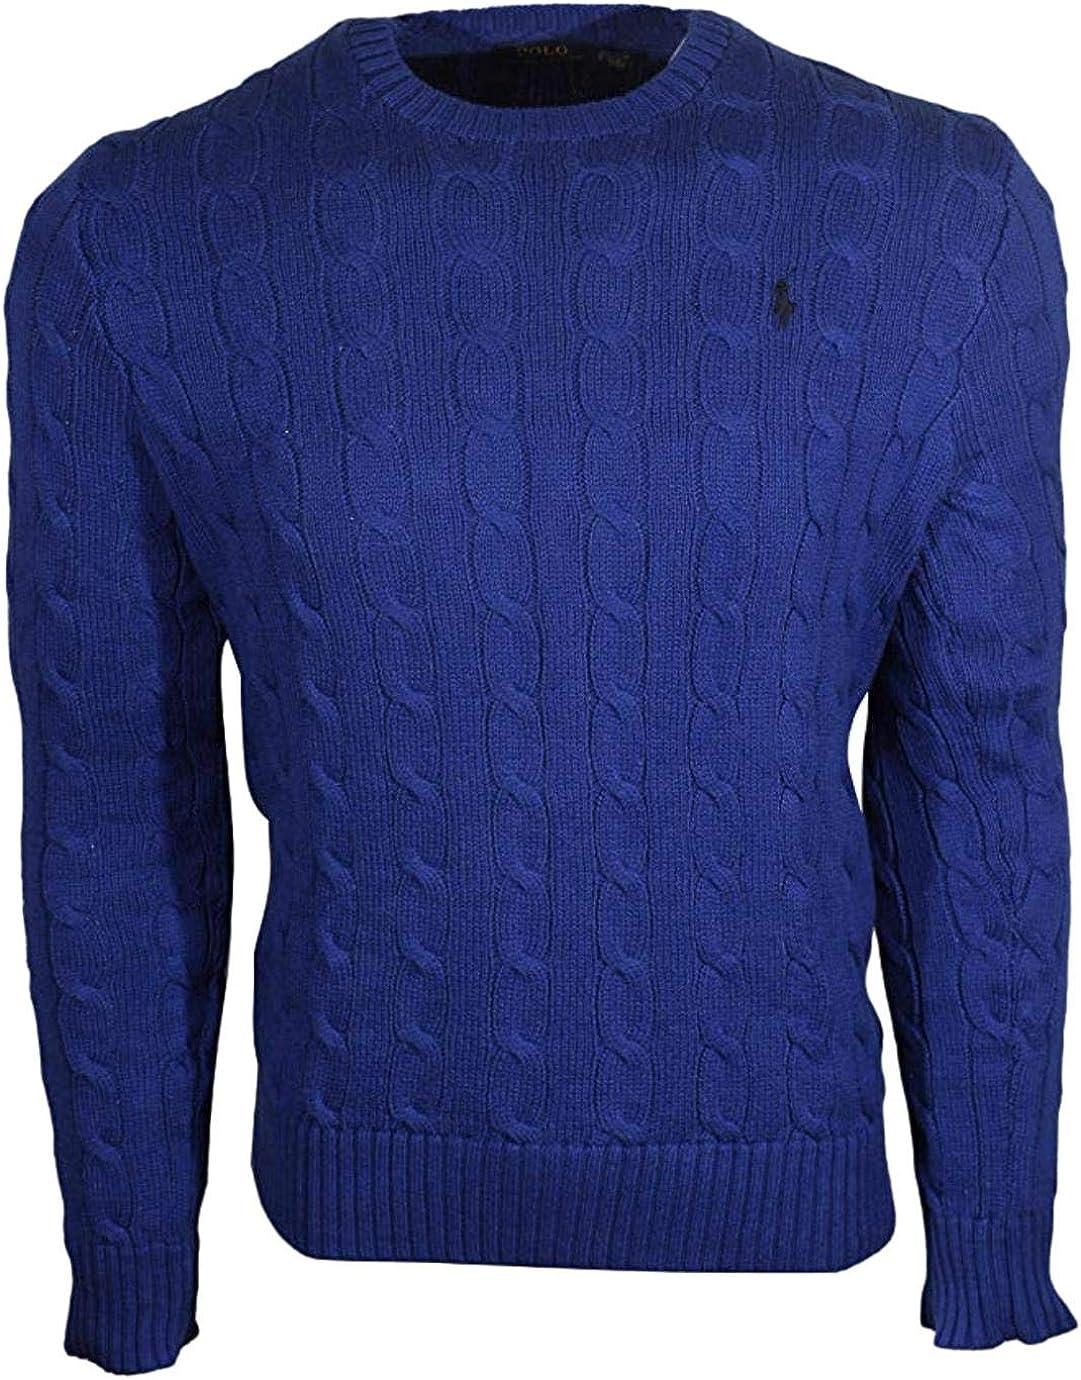 S/ /XXL verschiedene Farben Ralph Lauren Herrenpullover Rundhals gestrickt